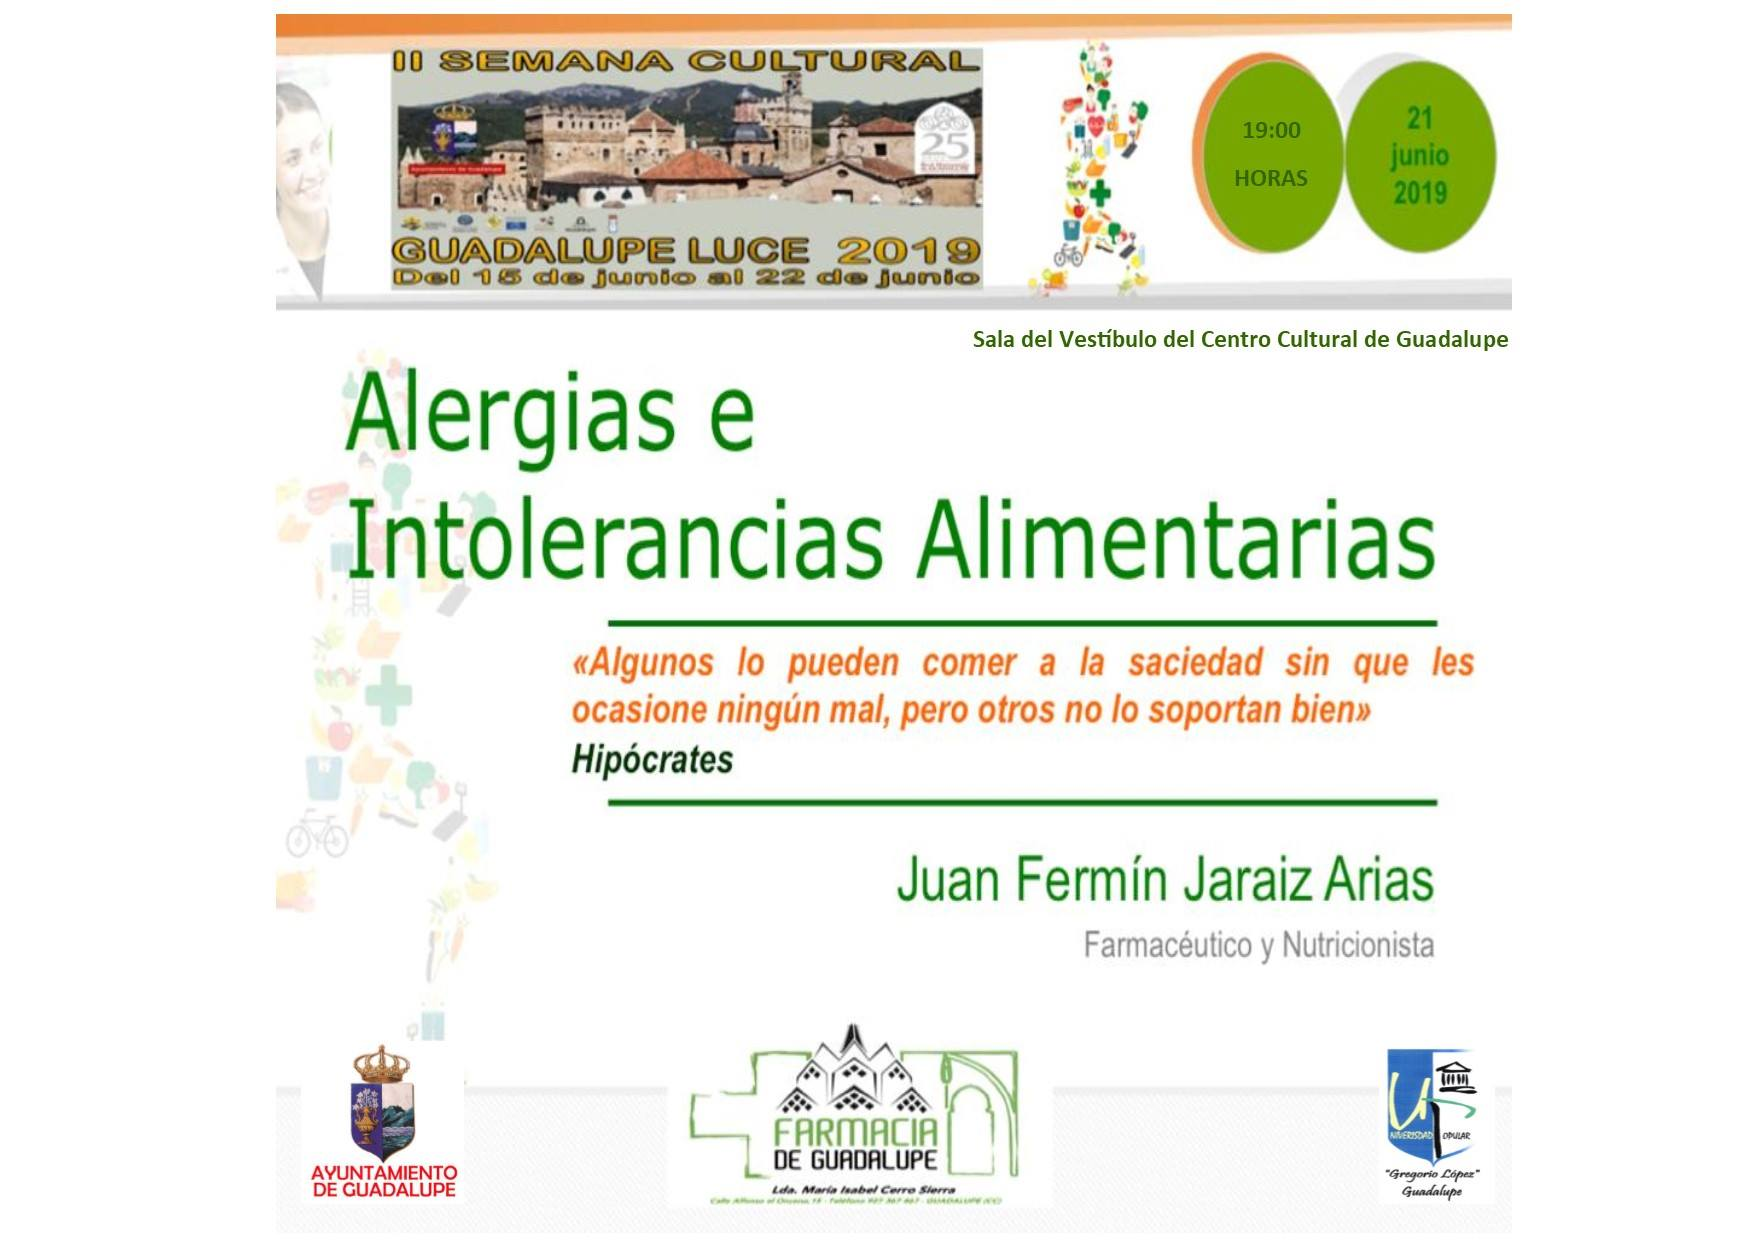 Charla-coloquio alergias e intolerancias alimentarias 2019 - Guadalupe (Cáceres)